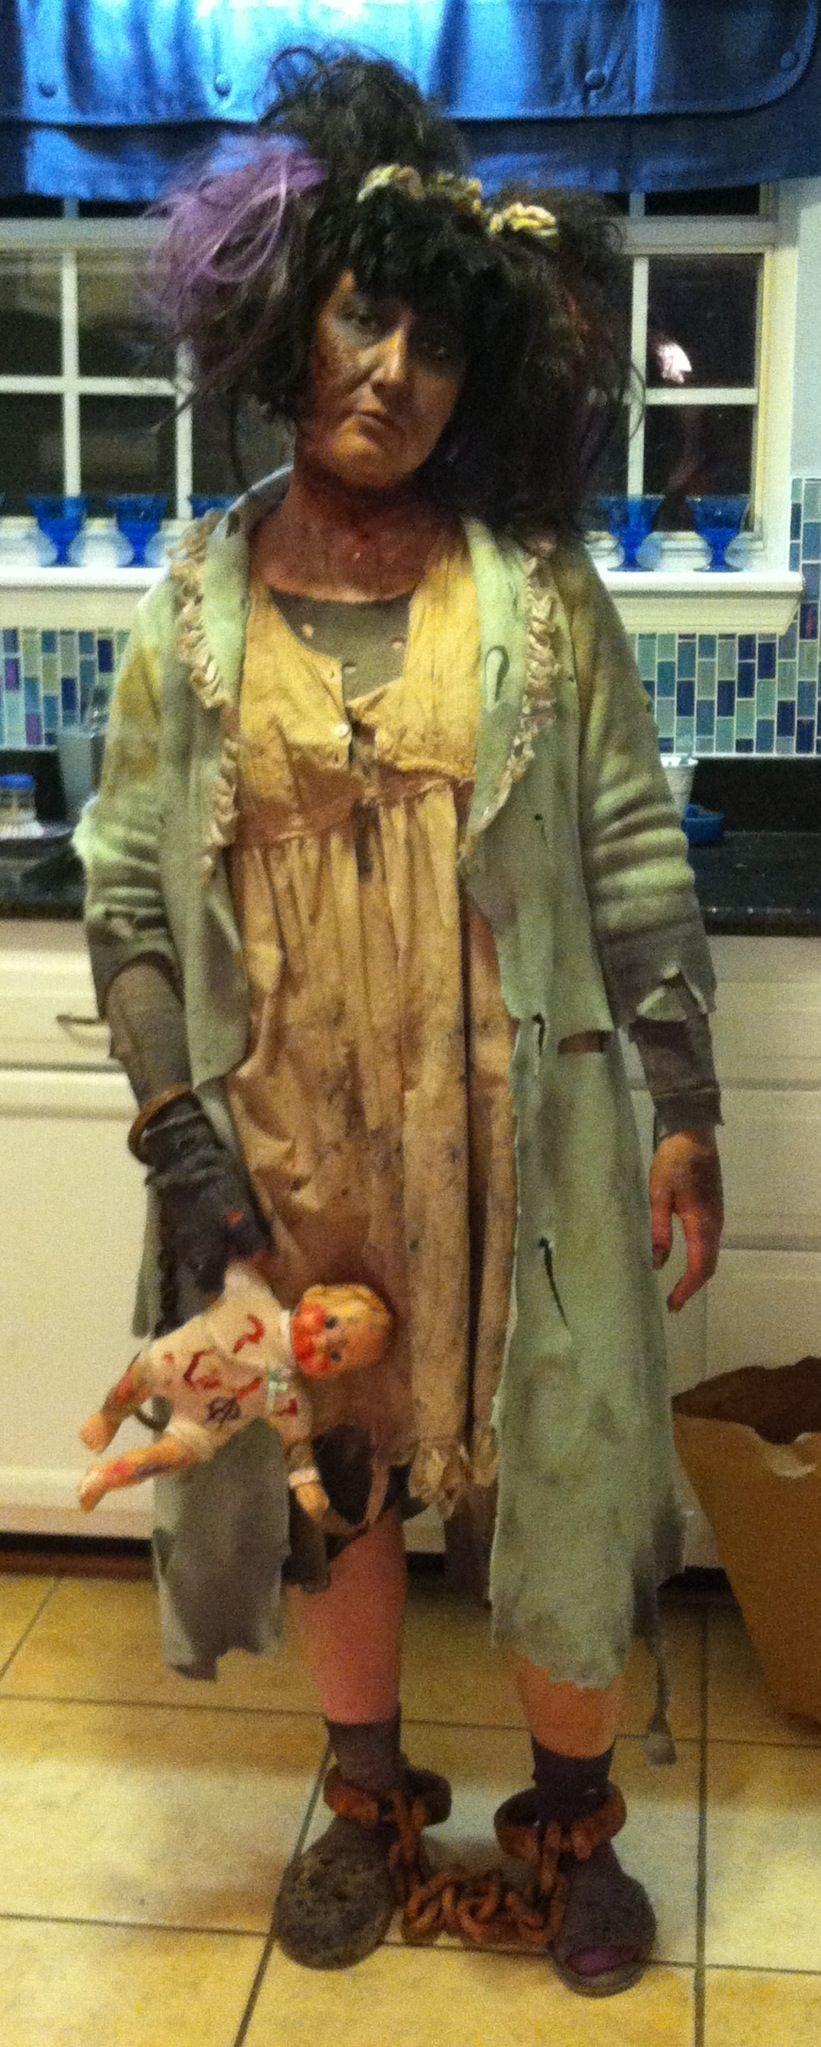 Asylum patient … | Halloween props | Pinterest | Asylum, Insane ...